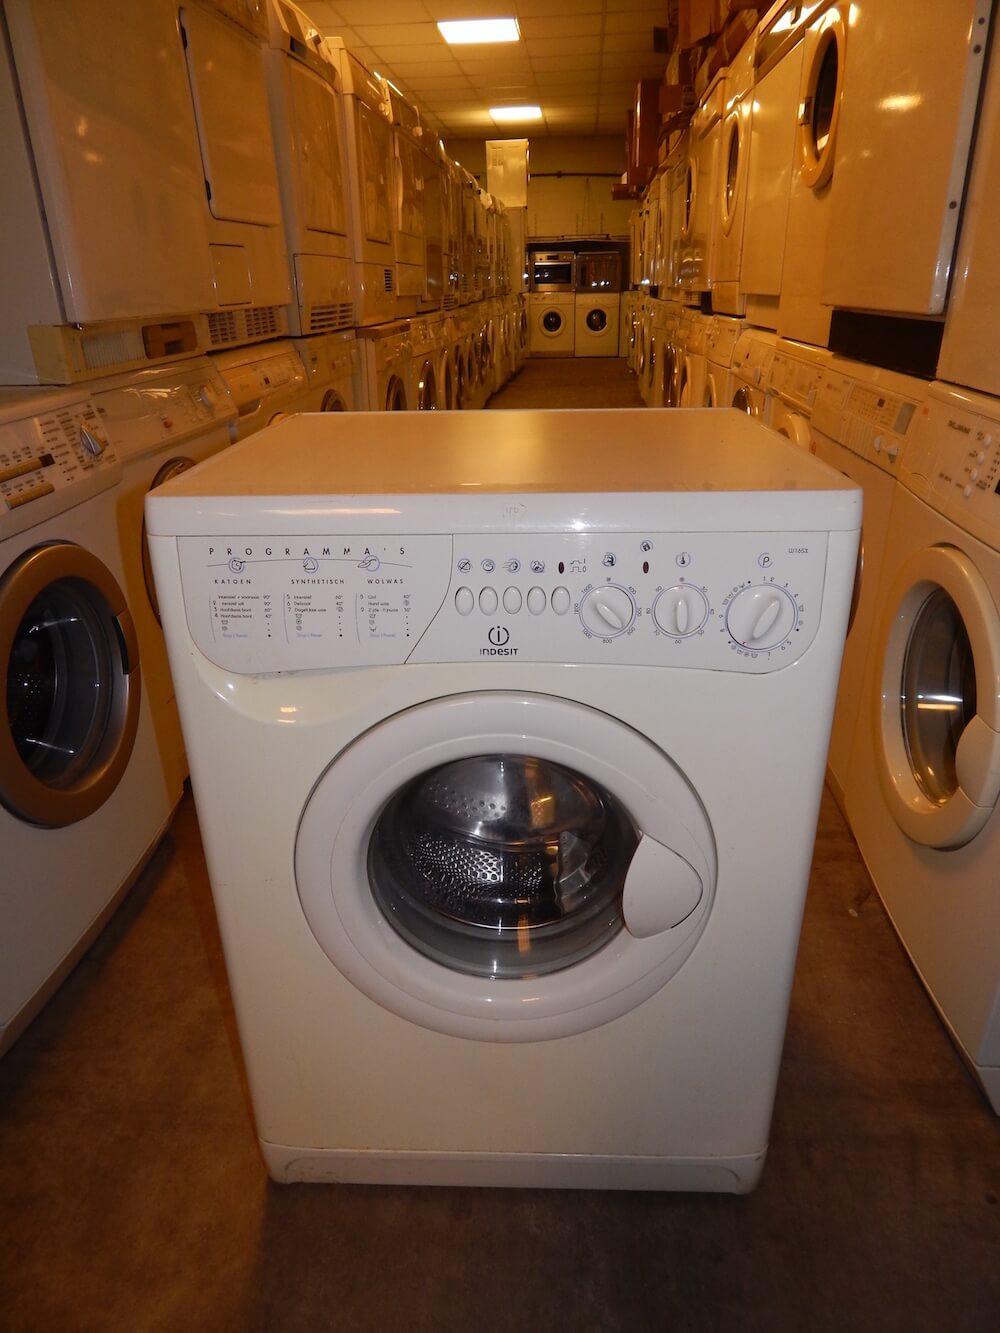 Goedkope wasmachine Utrecht